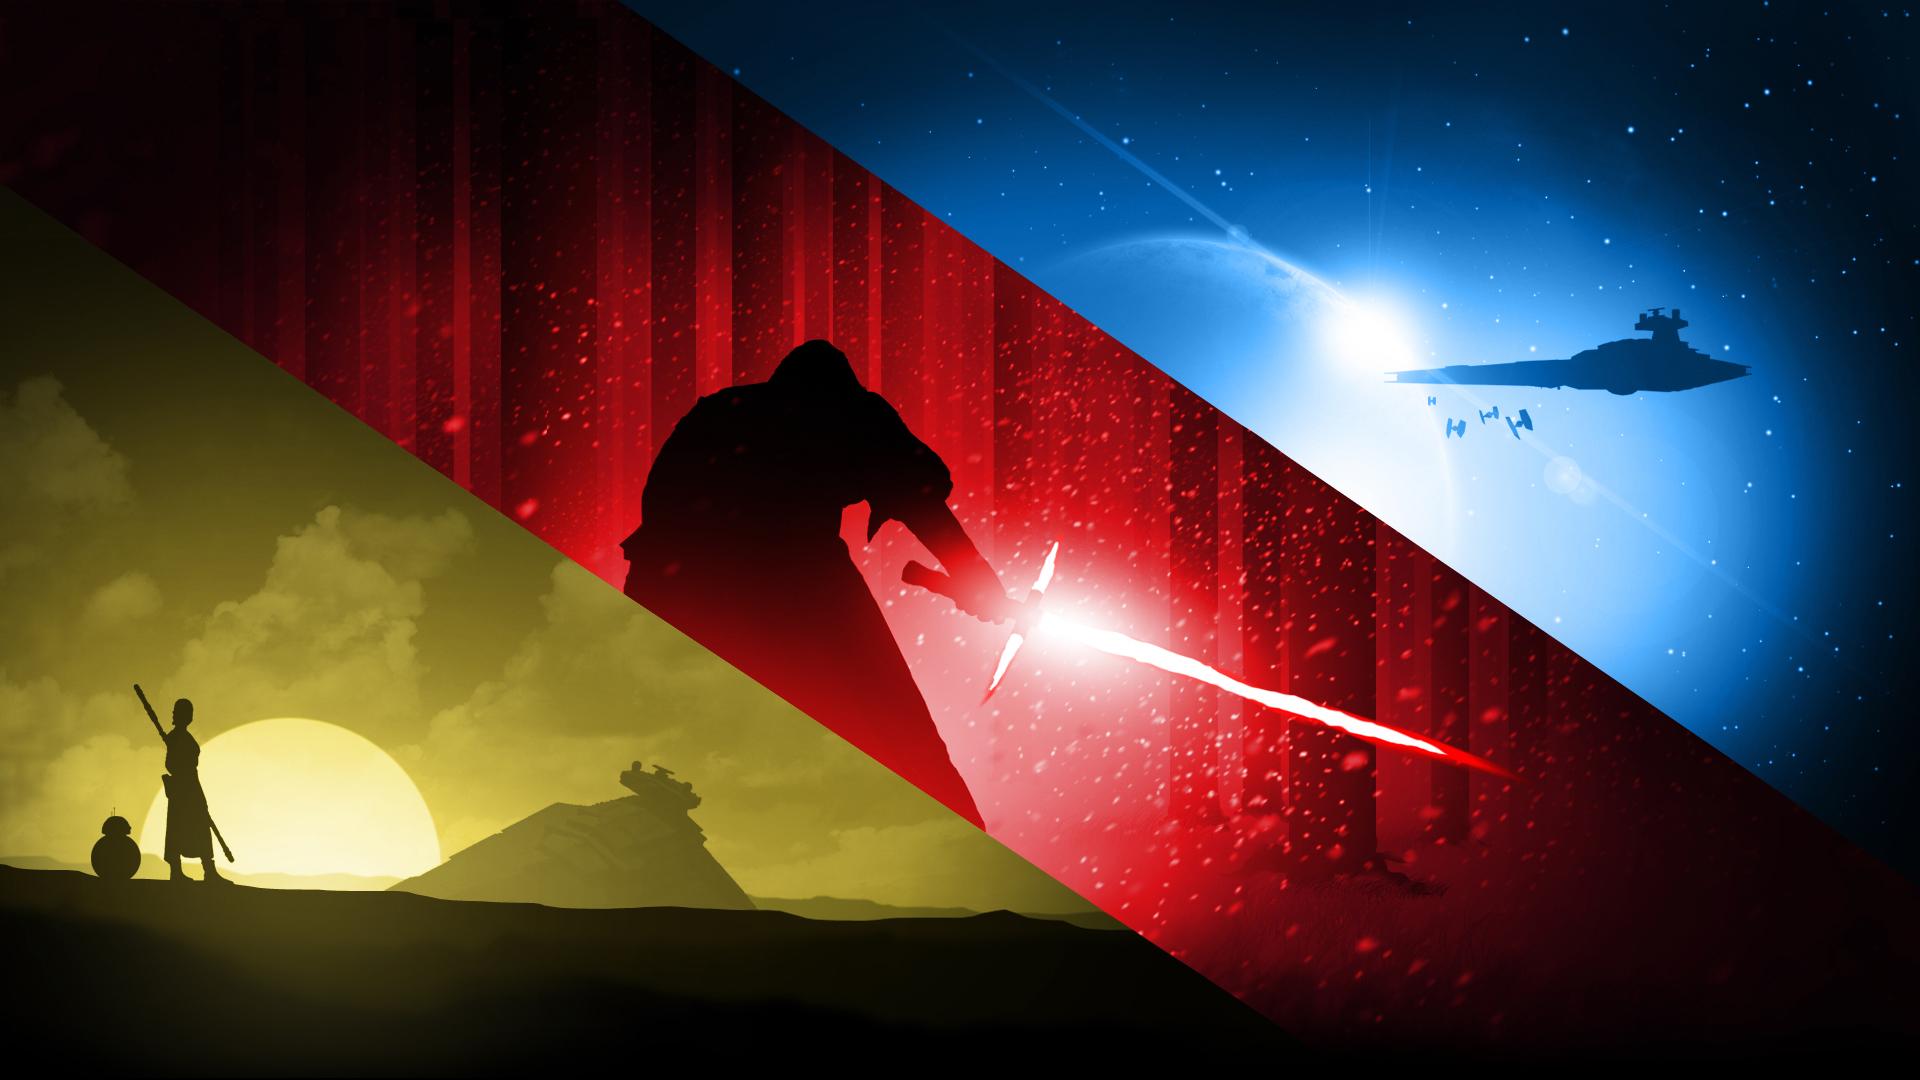 Force Awakens - Wallpaper (No logo